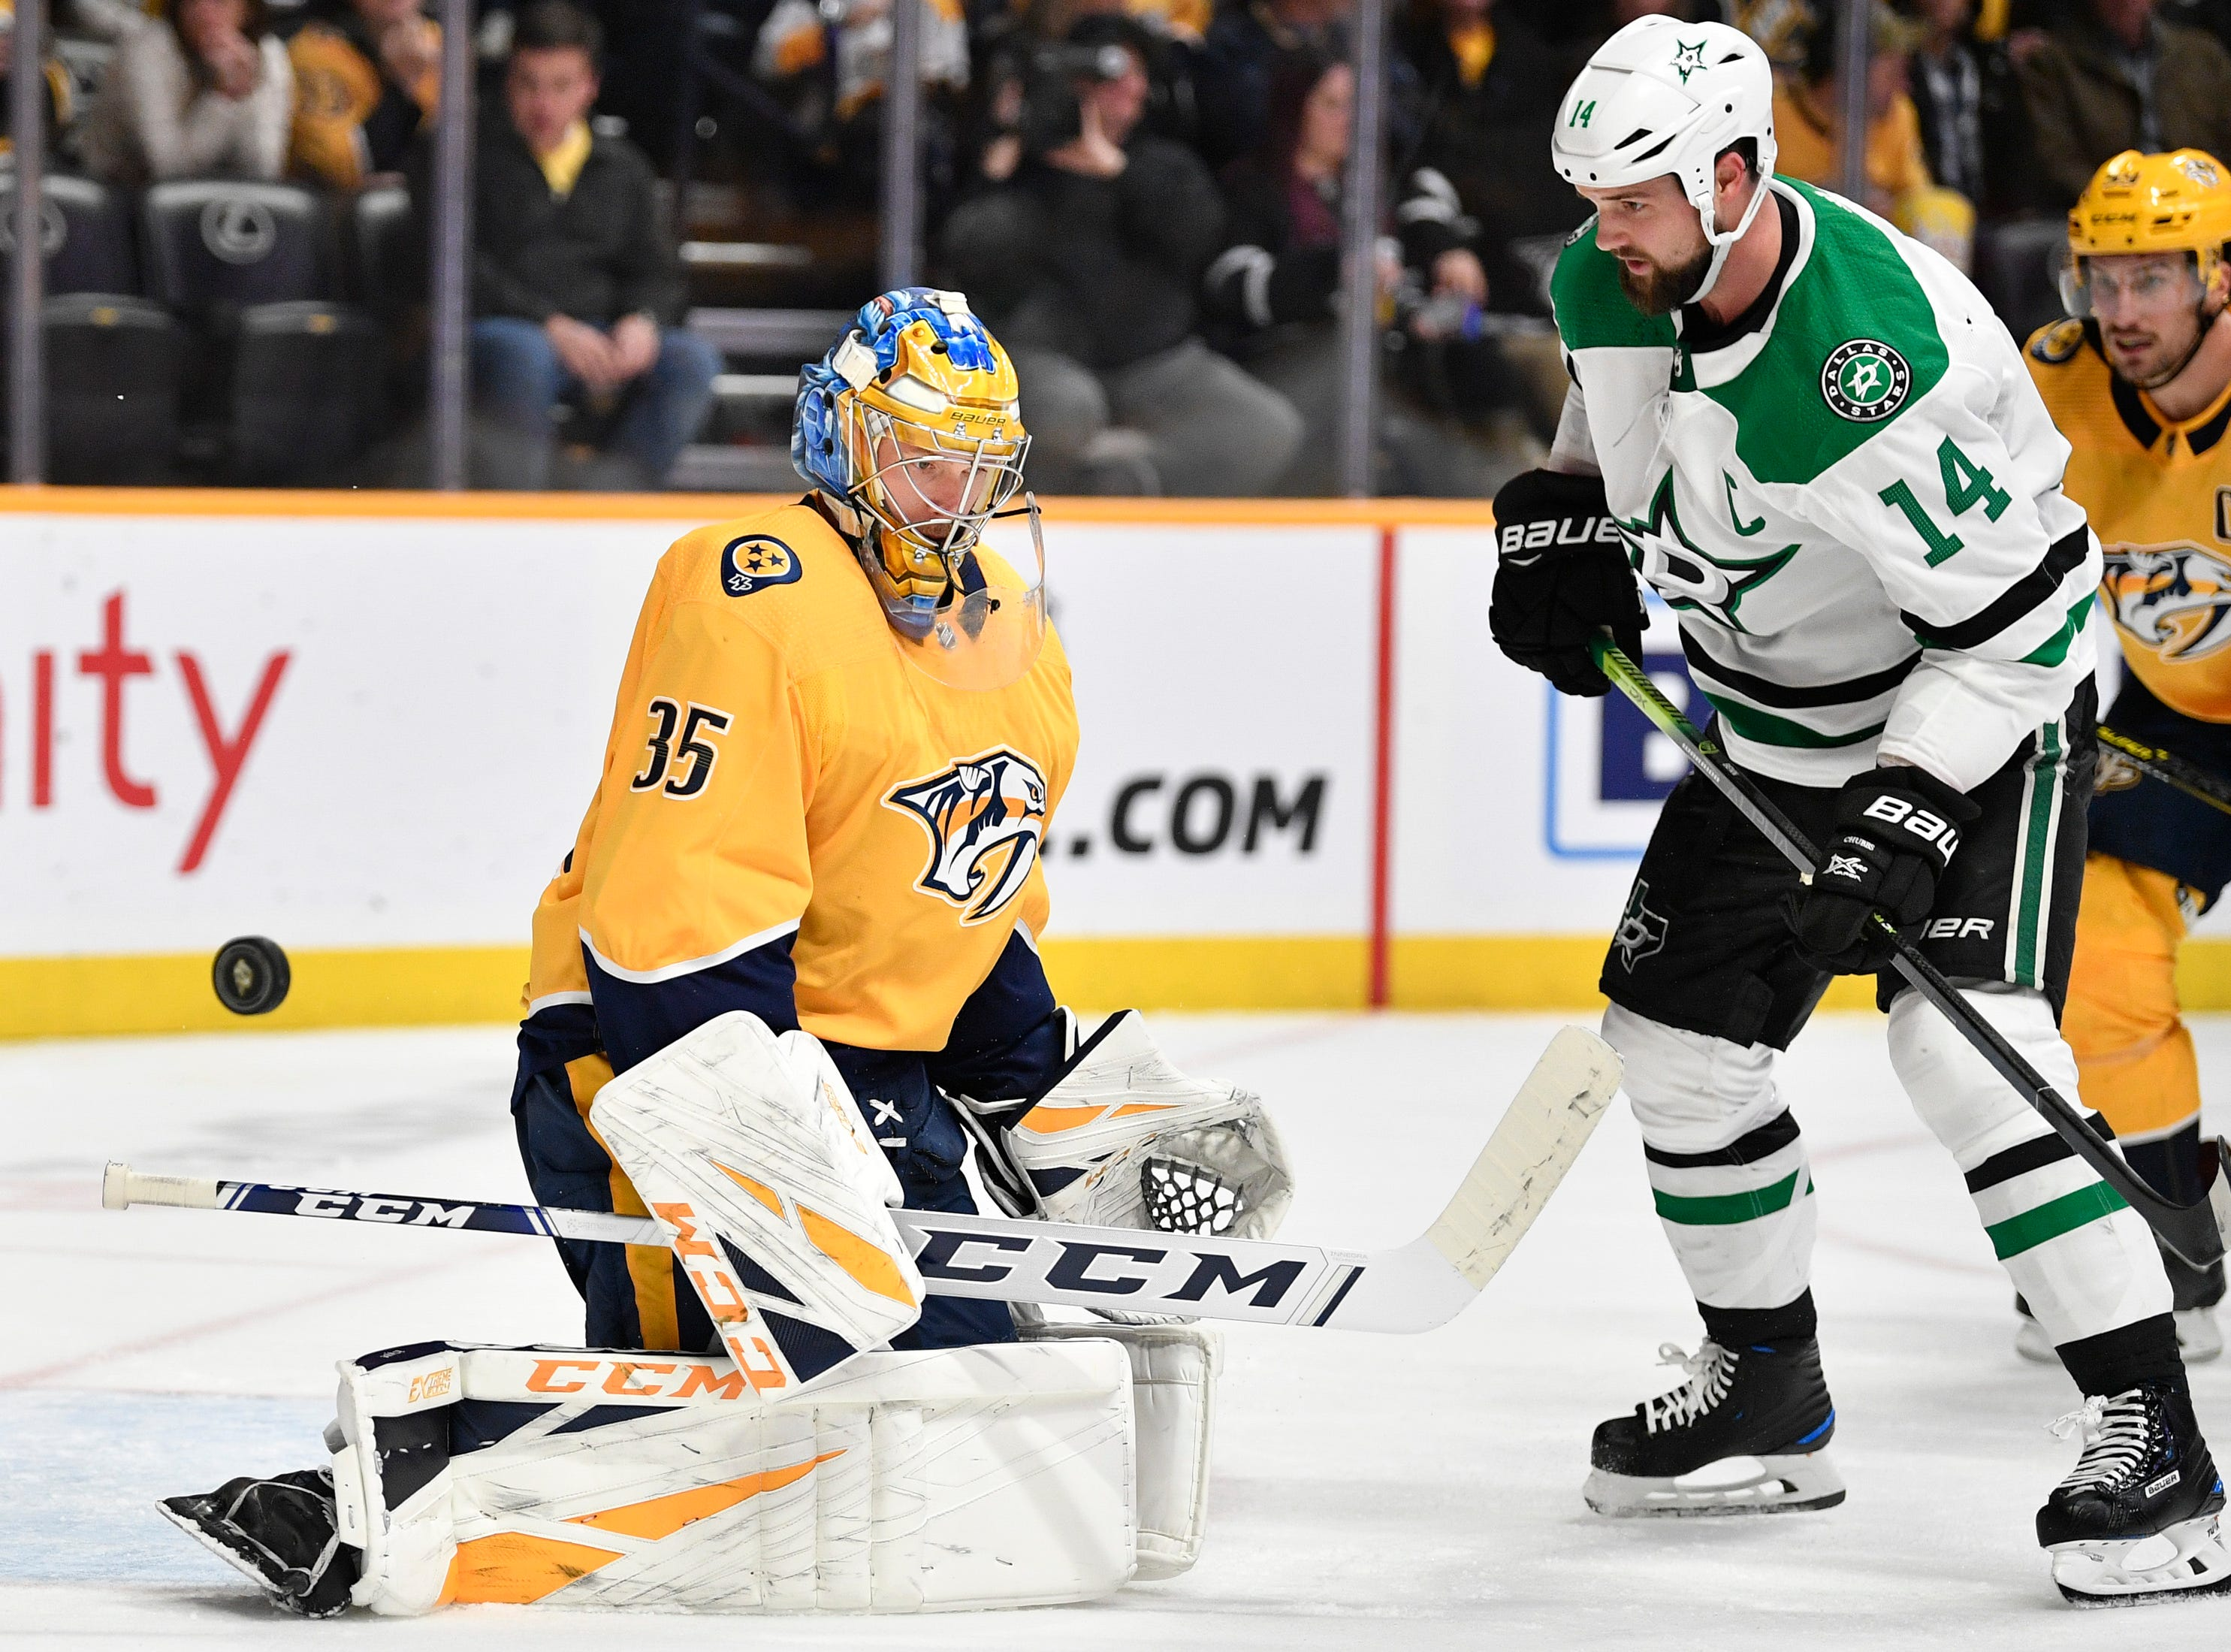 Nashville Predators goaltender Pekka Rinne (35) defends against Dallas Stars left wing Jamie Benn (14) during the second period at Bridgestone Arena in Nashville, Tenn., Saturday, Feb. 2, 2019.